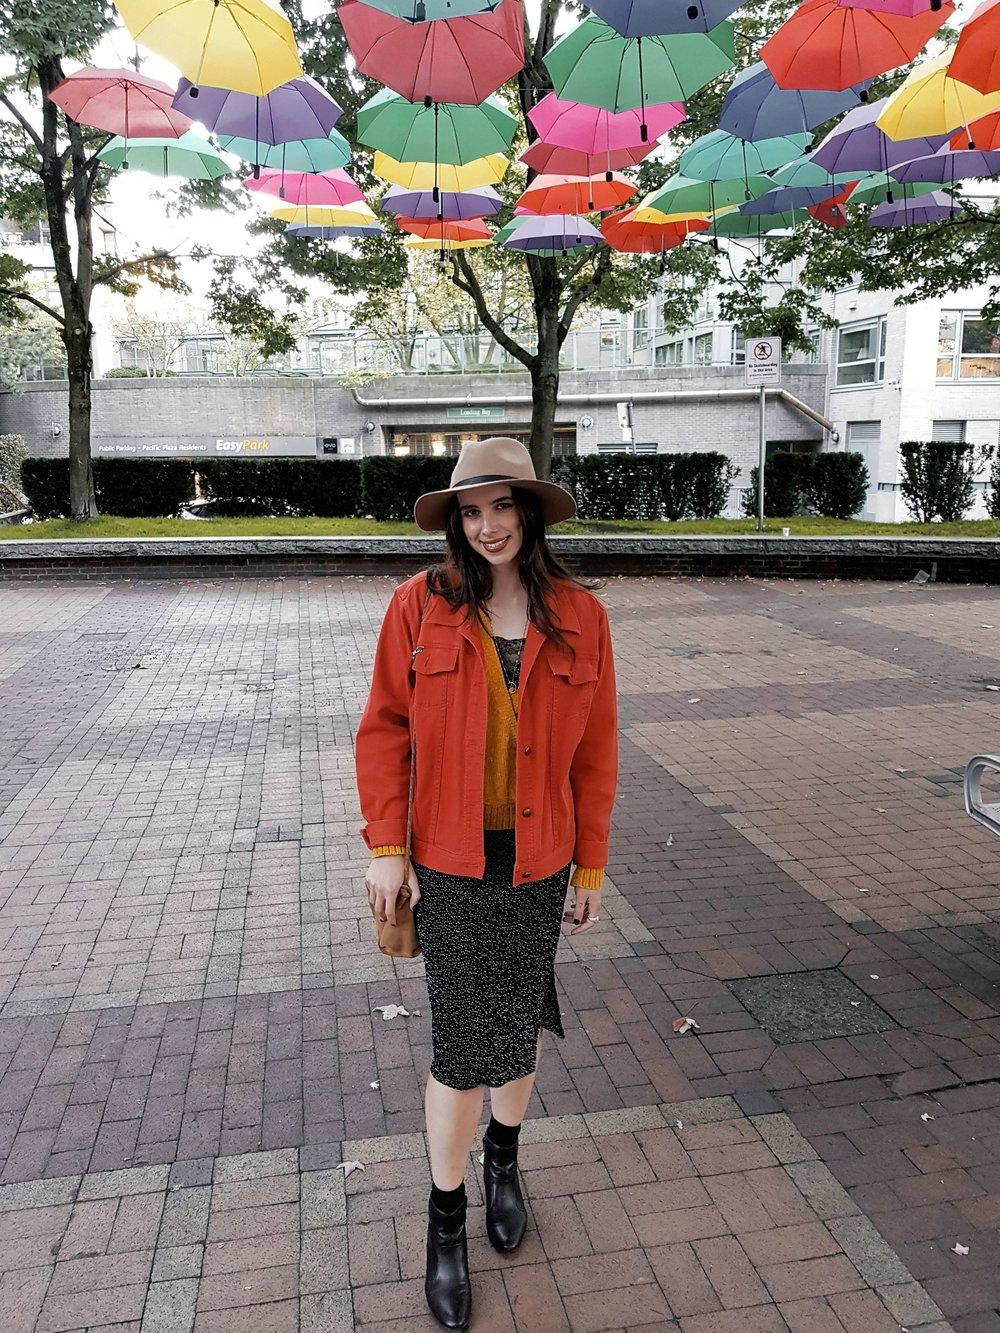 MONDAY - Dynamite dress, Ralph Lauren jacket, Urban Outfitters hat, Zara purse, sweater bought at Winners